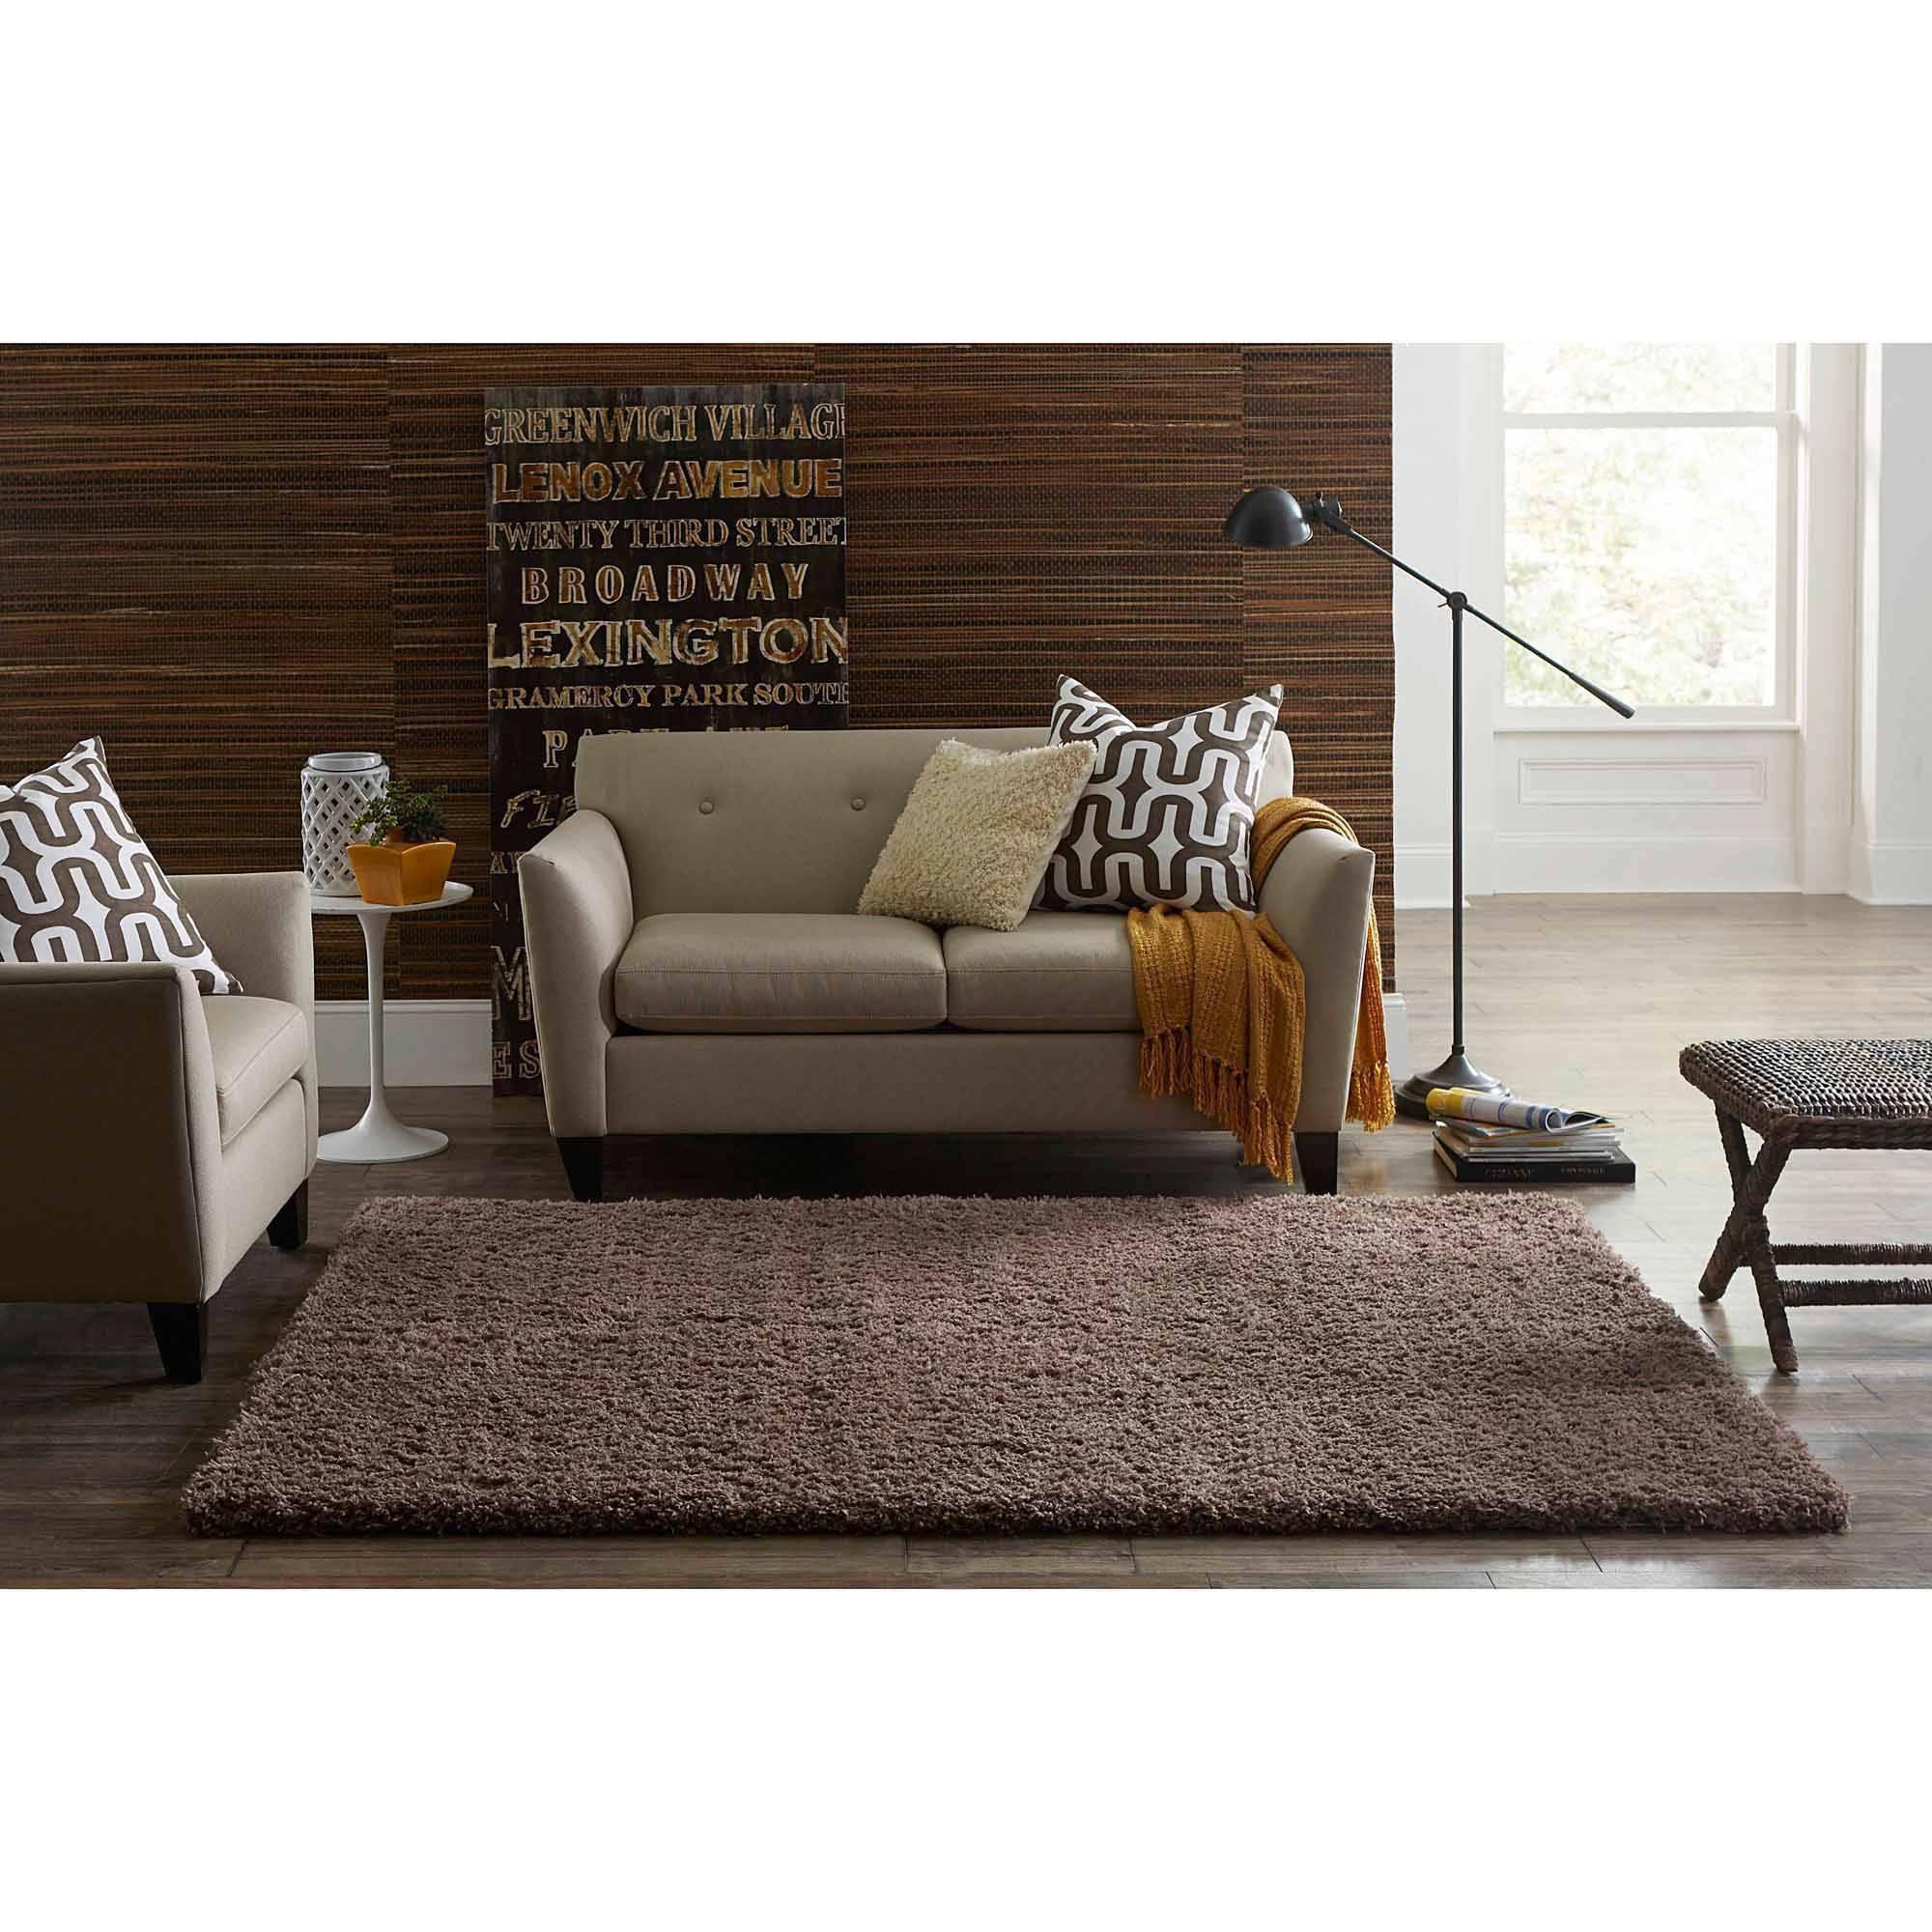 Shag Area Rugs spaces home&beyondwelspun teddy shag area rug, multiple colors